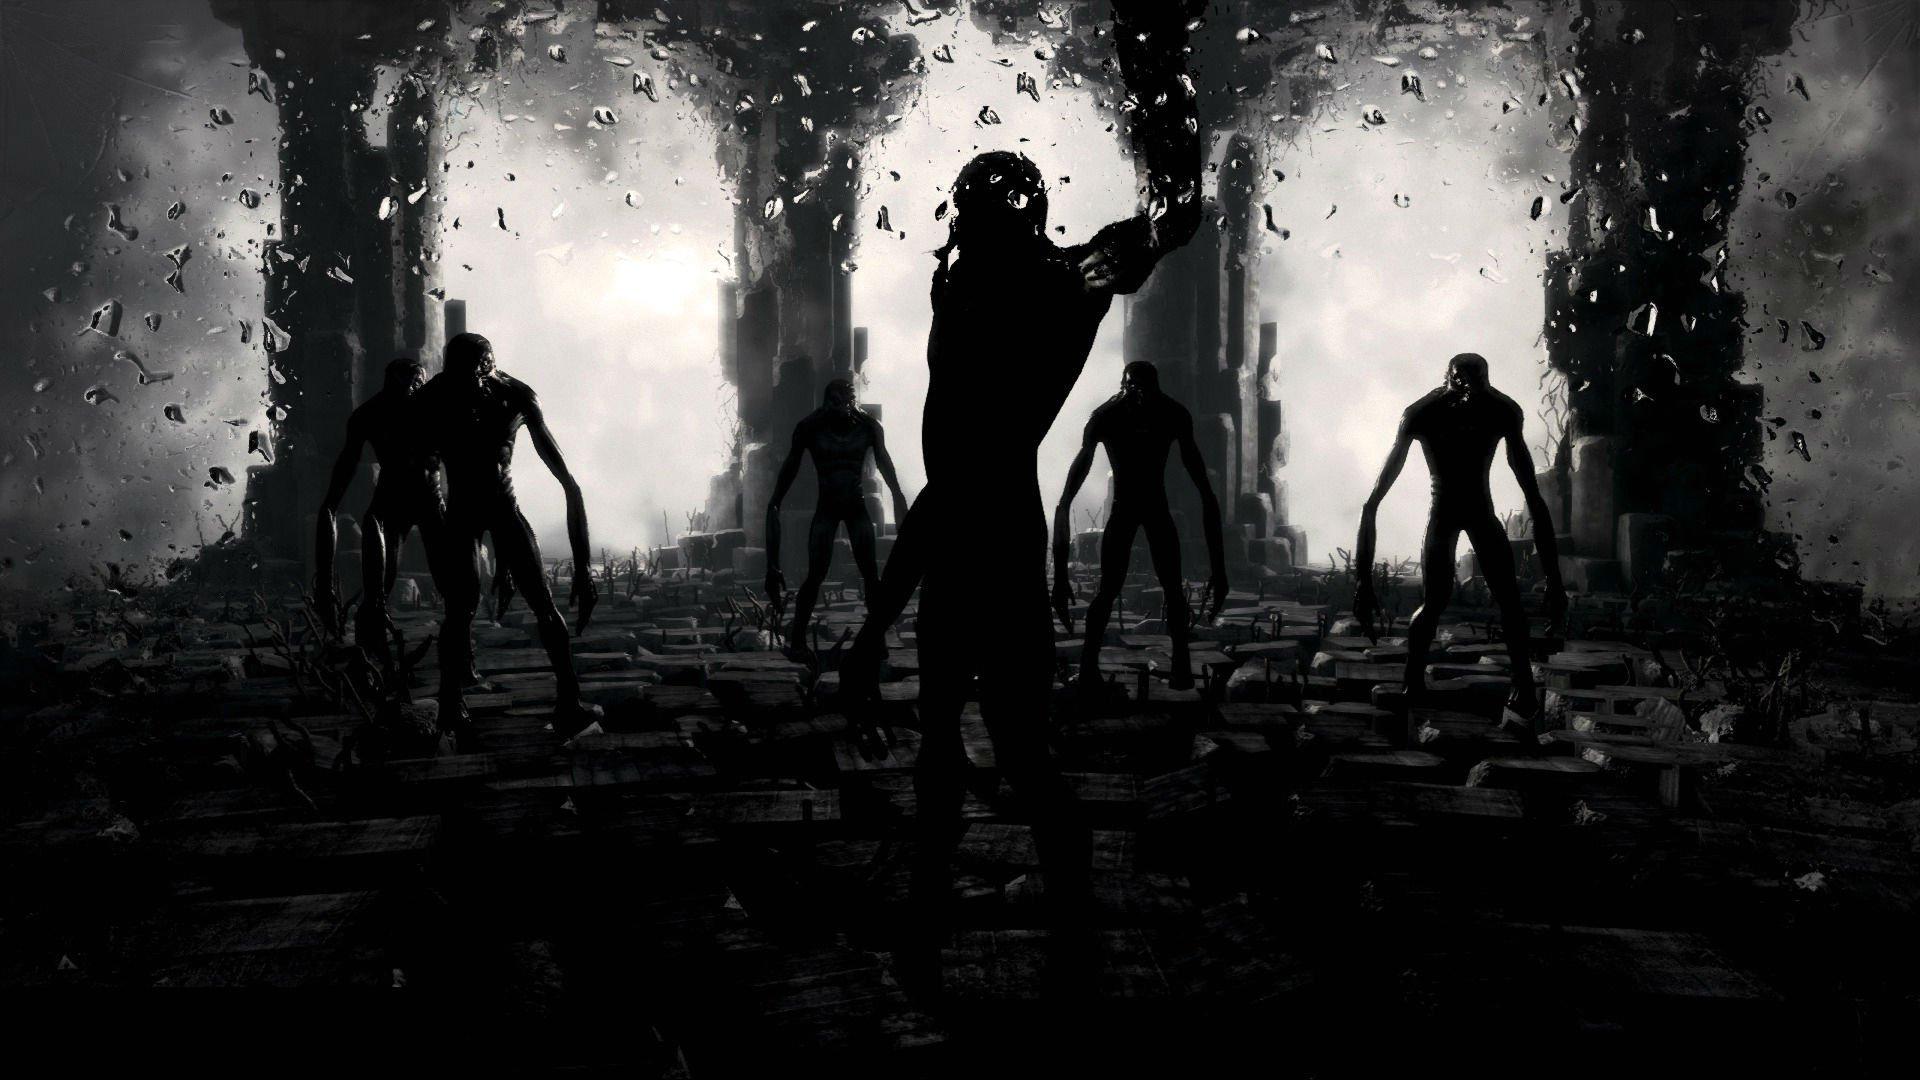 metro survival horror shooter sci fi apocalyptic dark 2033